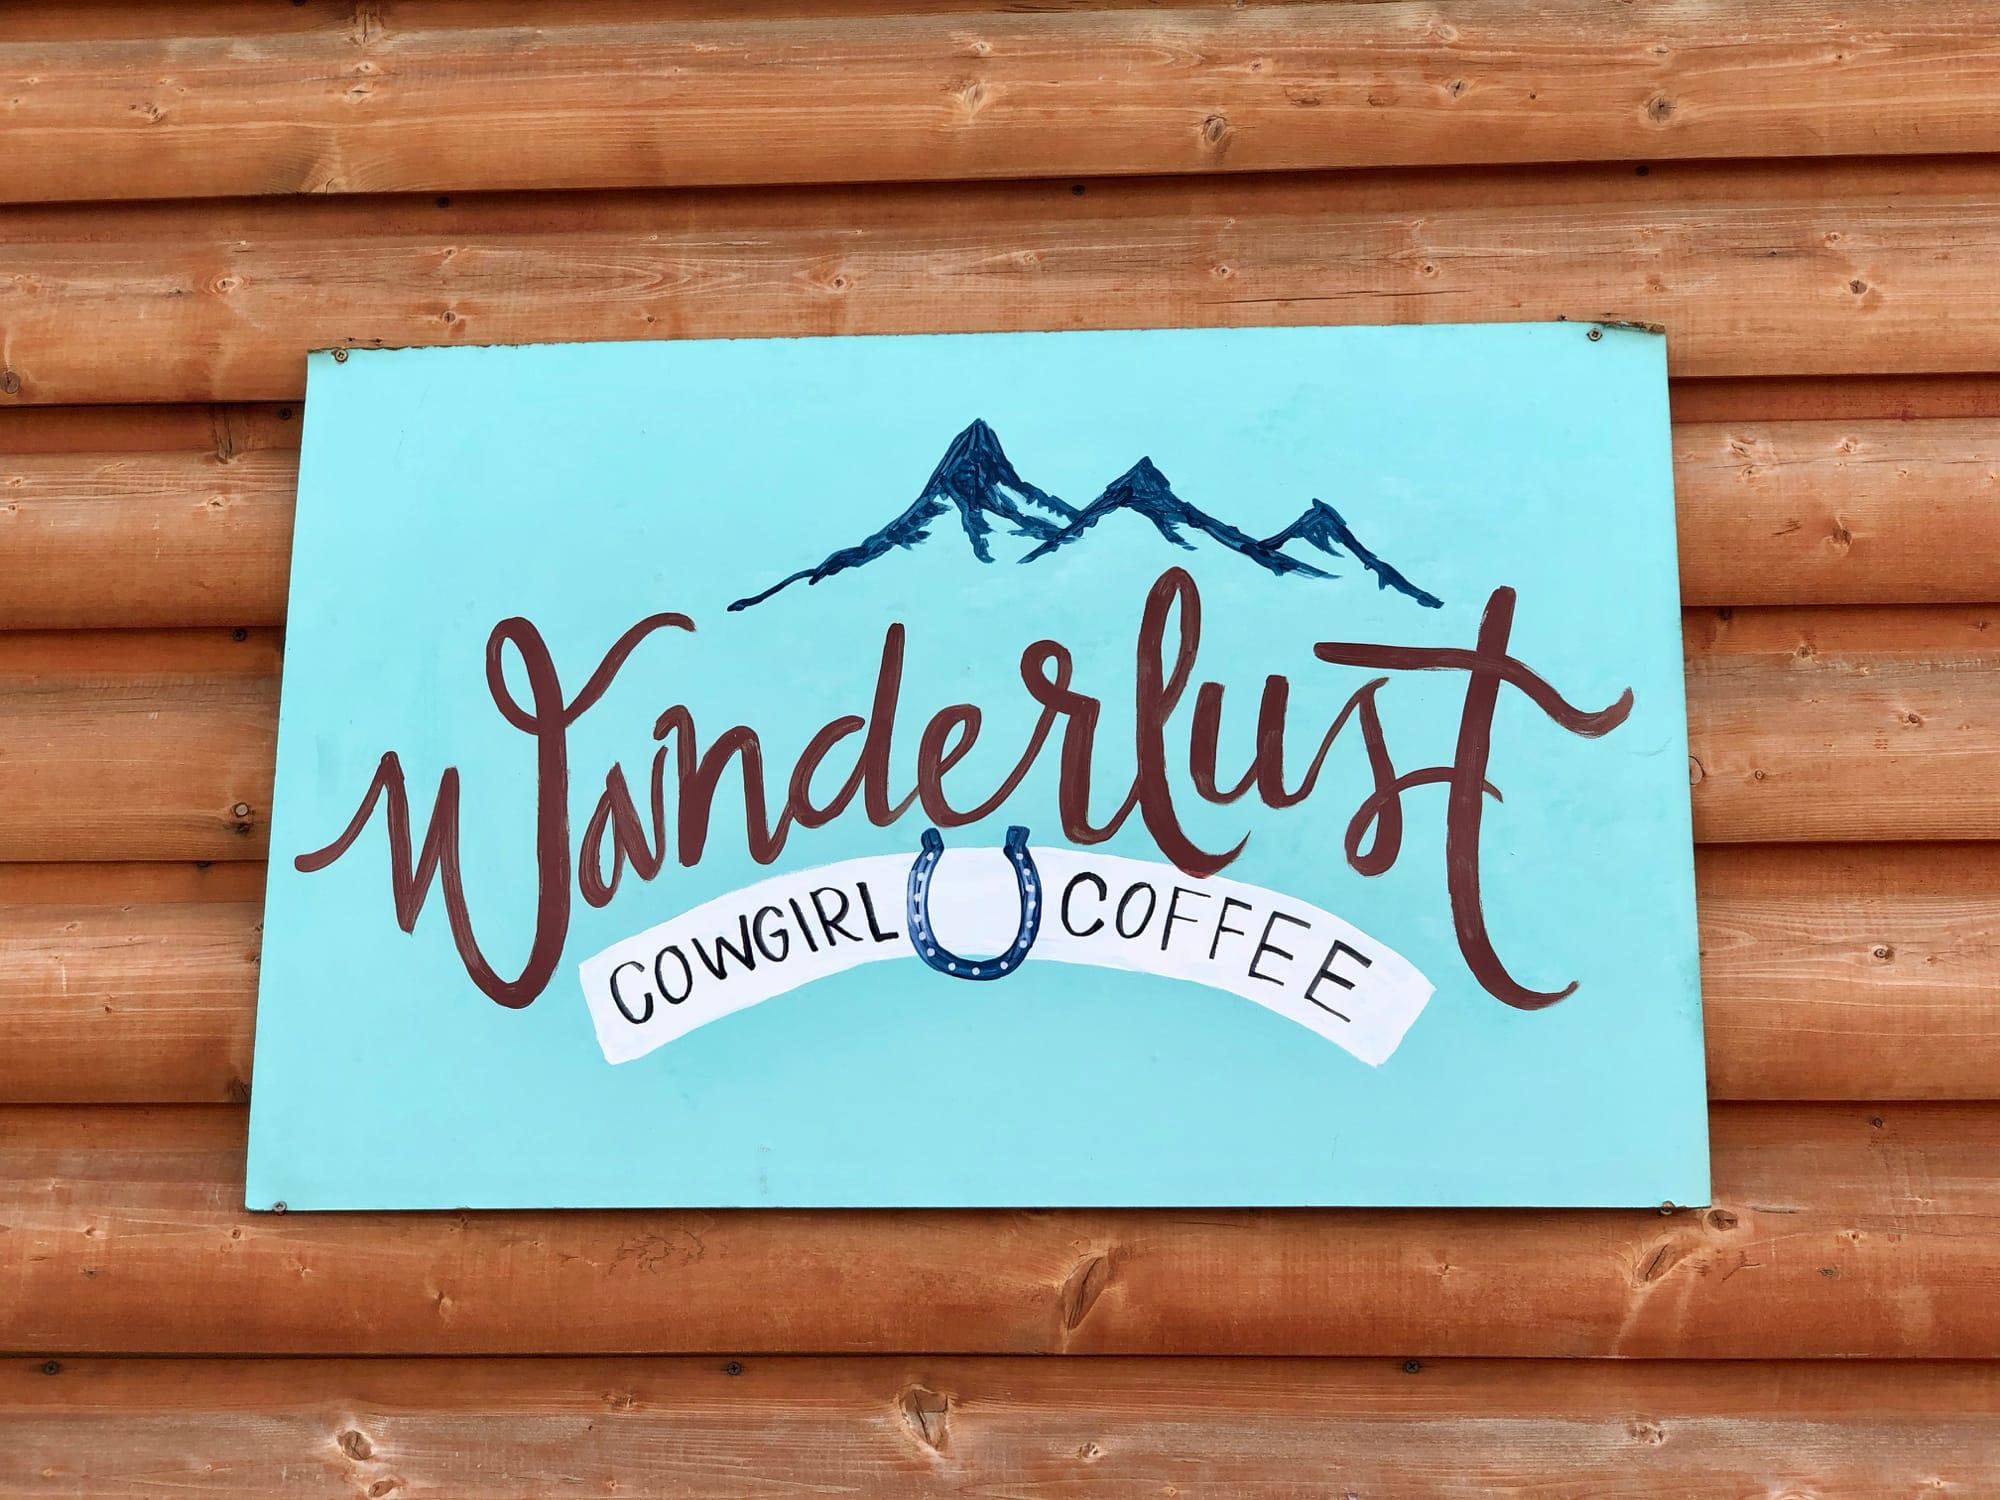 Wanderlust Cowgirl Coffee